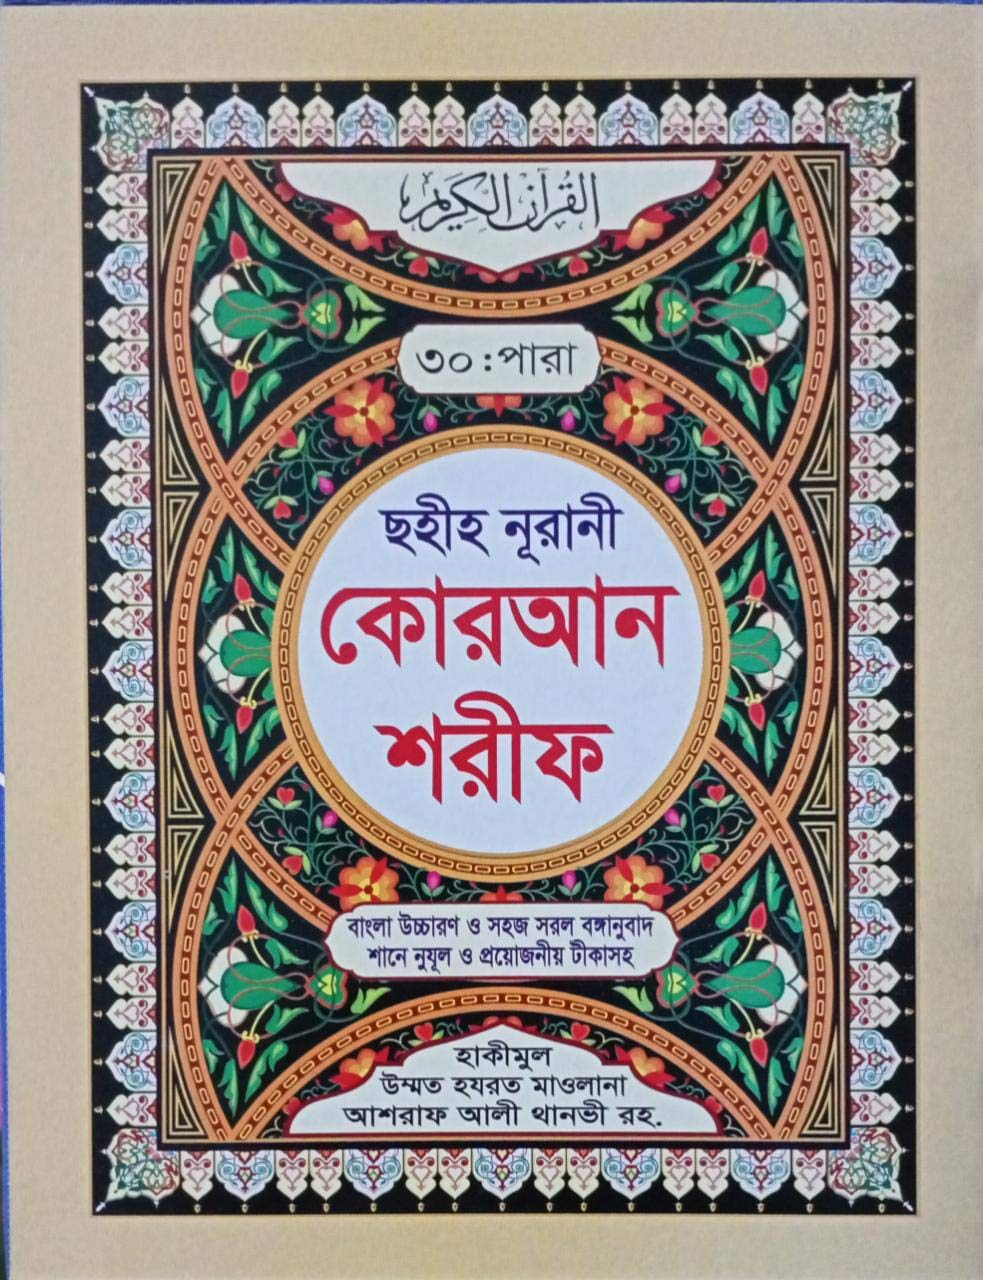 Noorani Sahih Quran – Al Quran Ul Kareem – Para Set – 30 books in a Protecting & Travel VIP bag – Bangla translation with summarised tafseer and pronunciation – Big Font Size – বাংলা কুরআন ৩০ পারা সেট